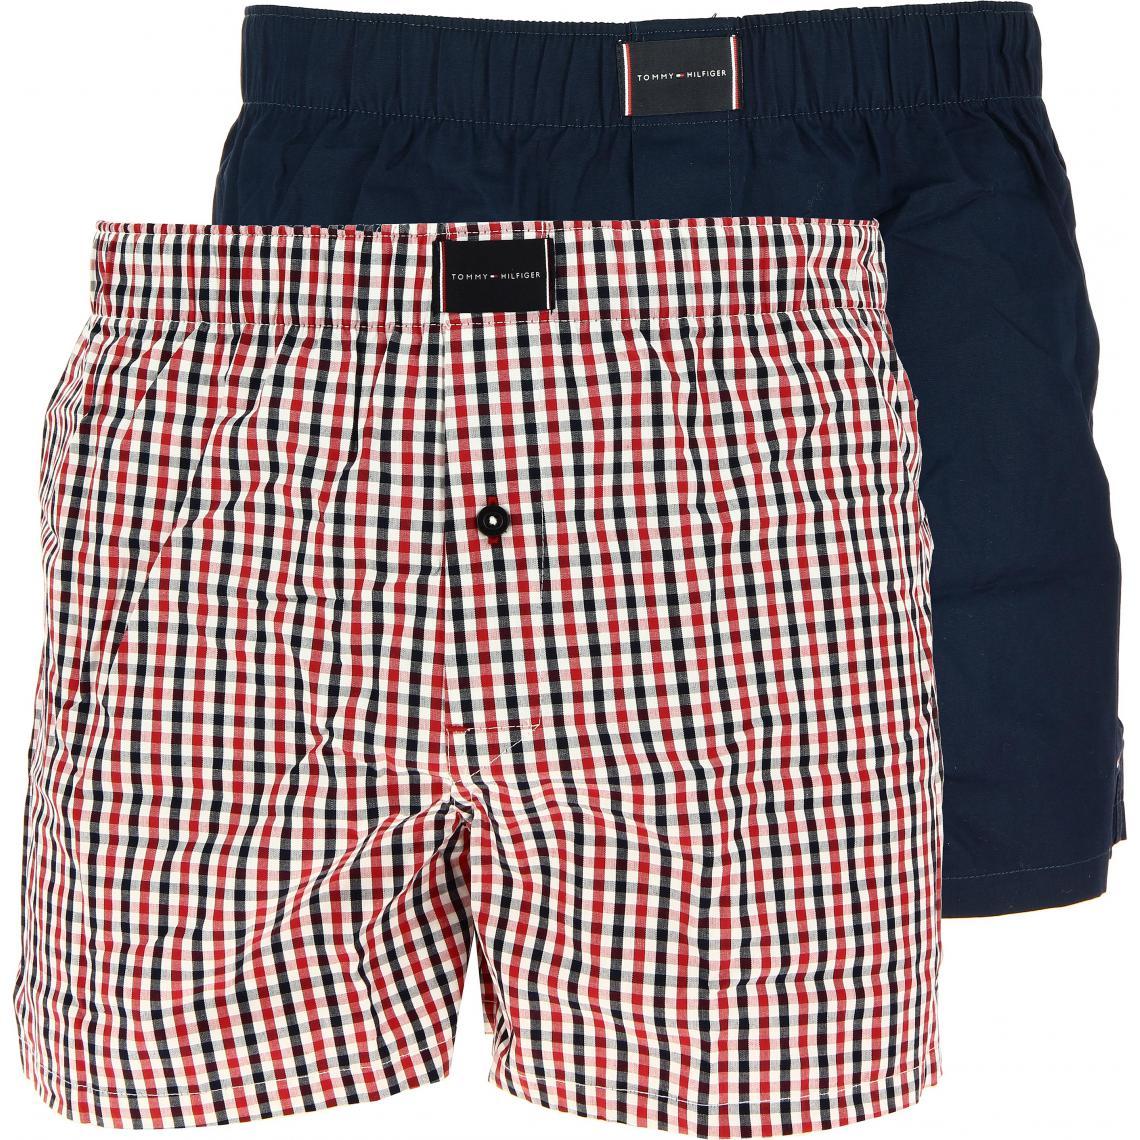 2P WOVEN BOXER CHECK Tommy Hilfiger Underwear